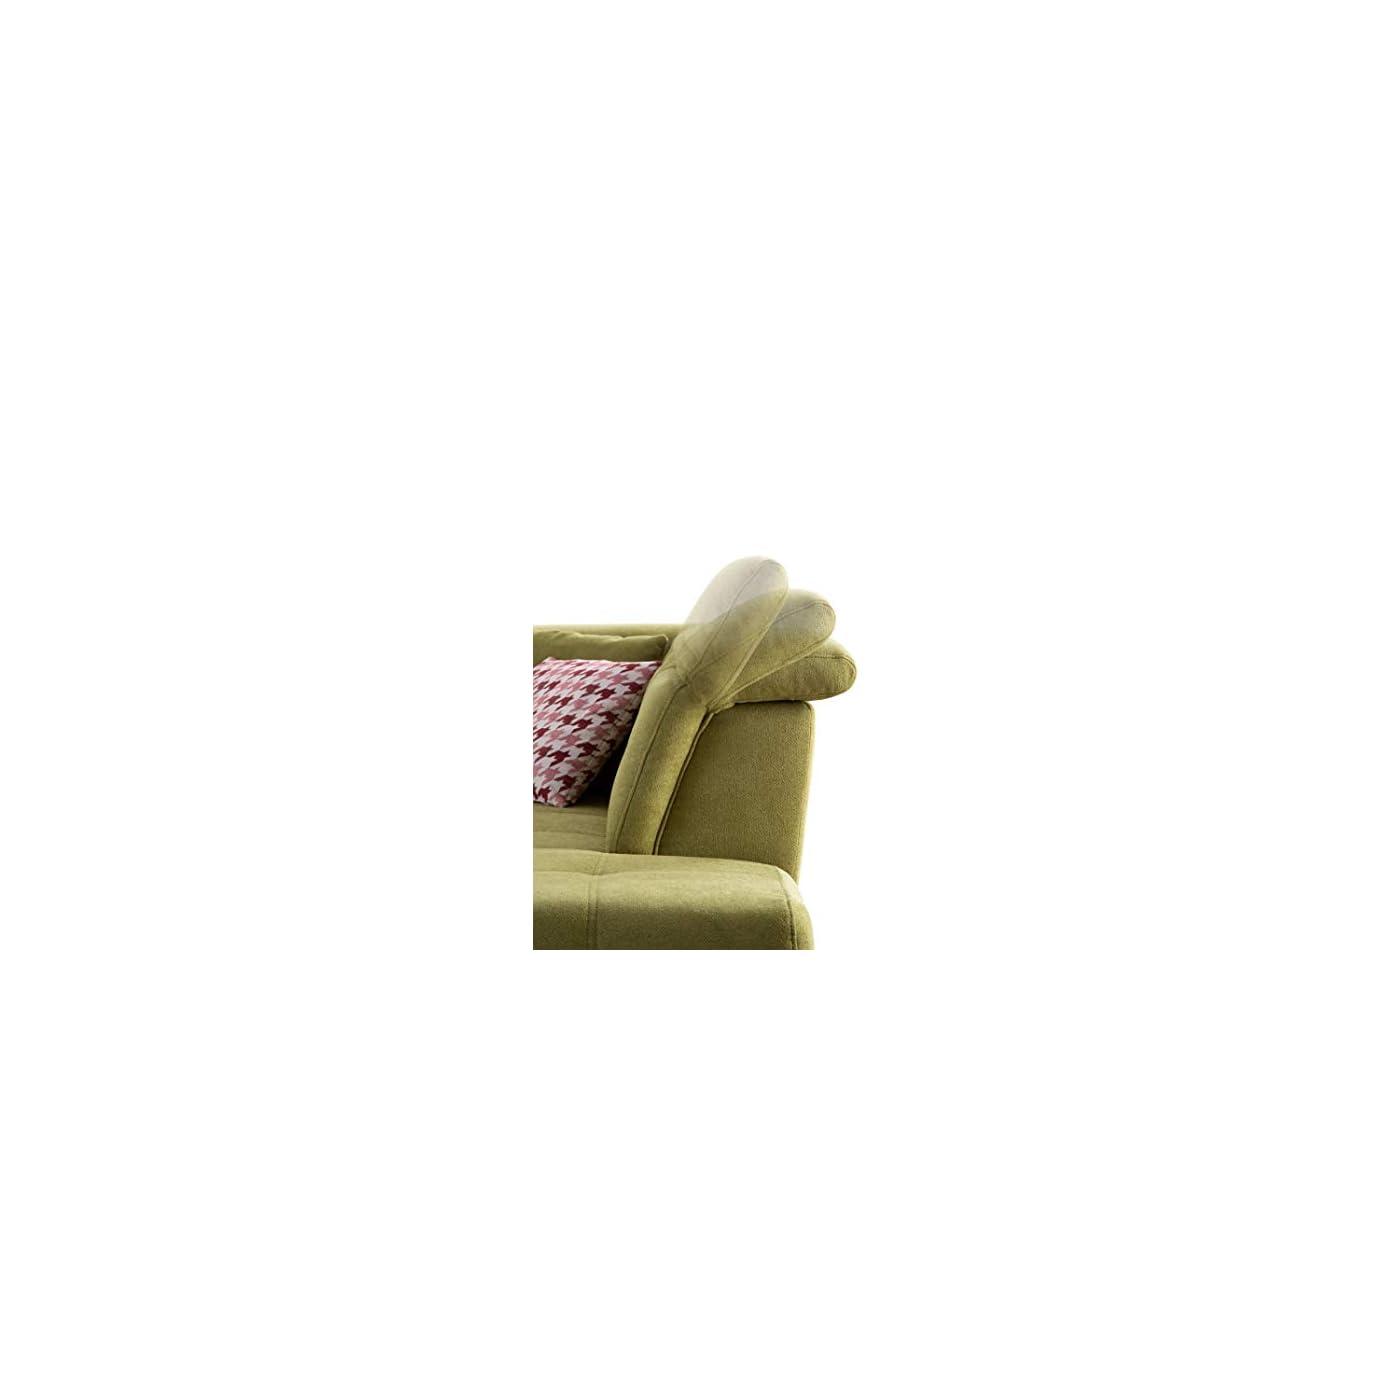 sofa bed-side